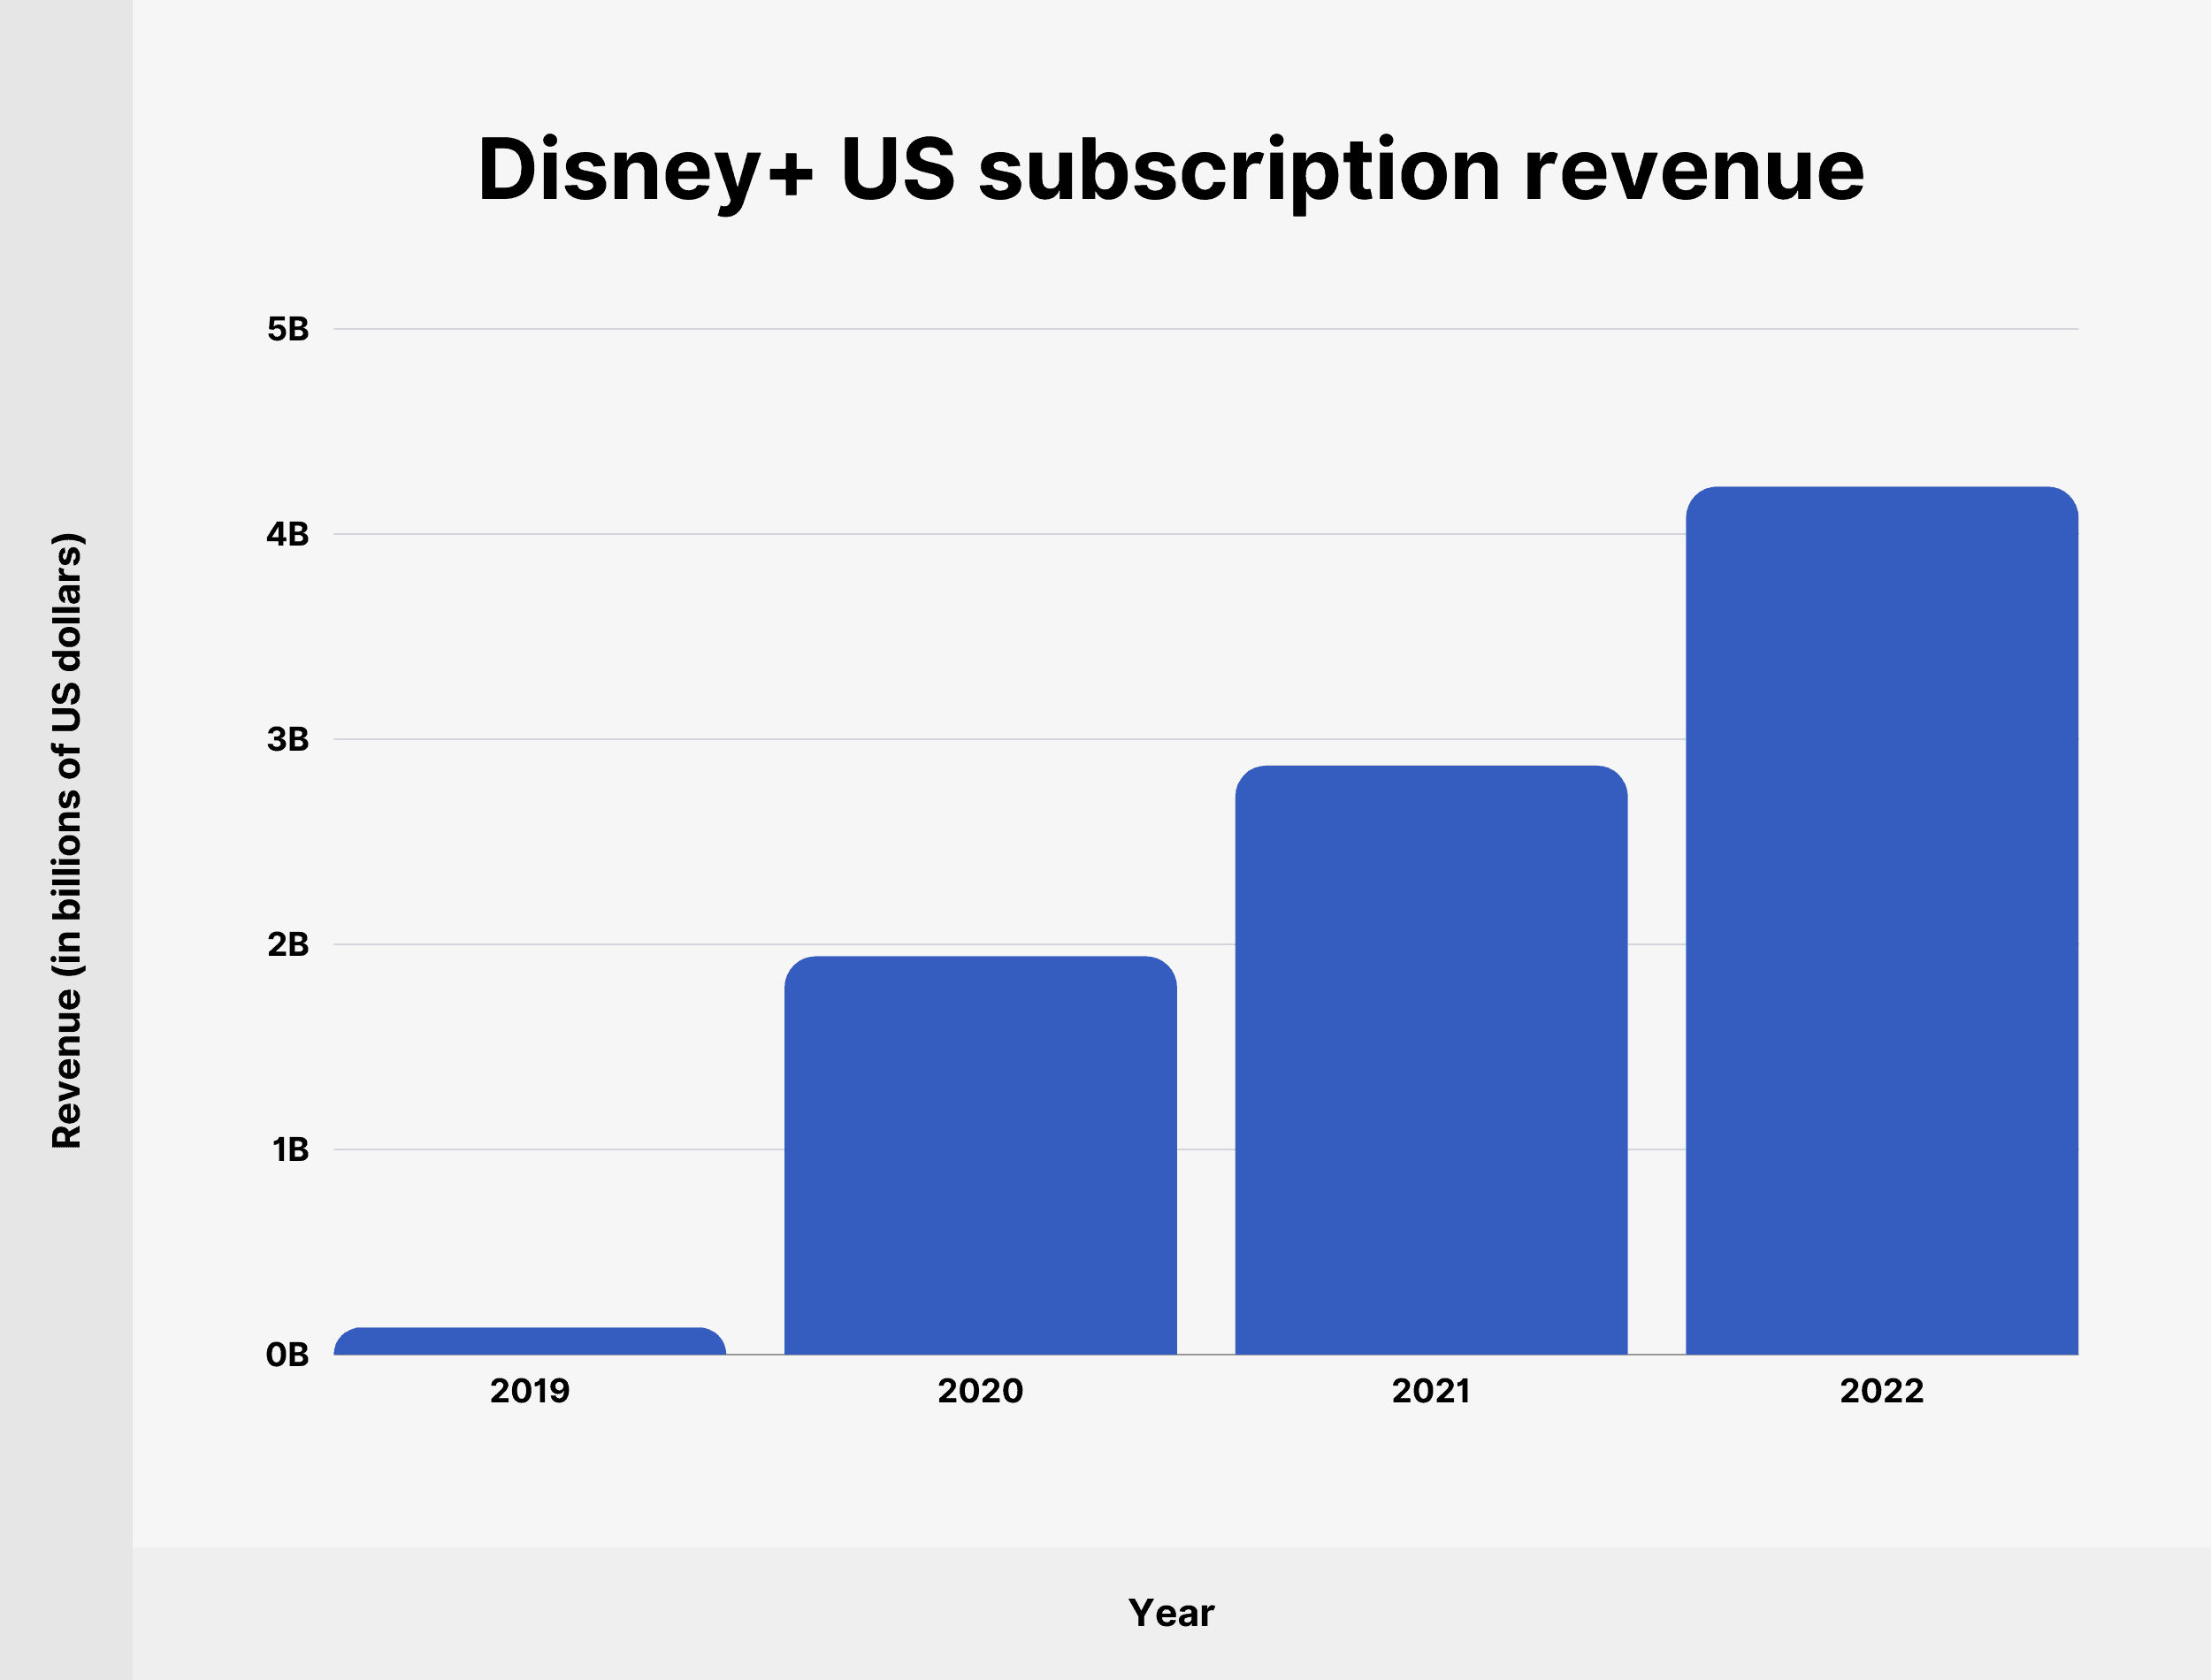 Disney+ US subscription revenue